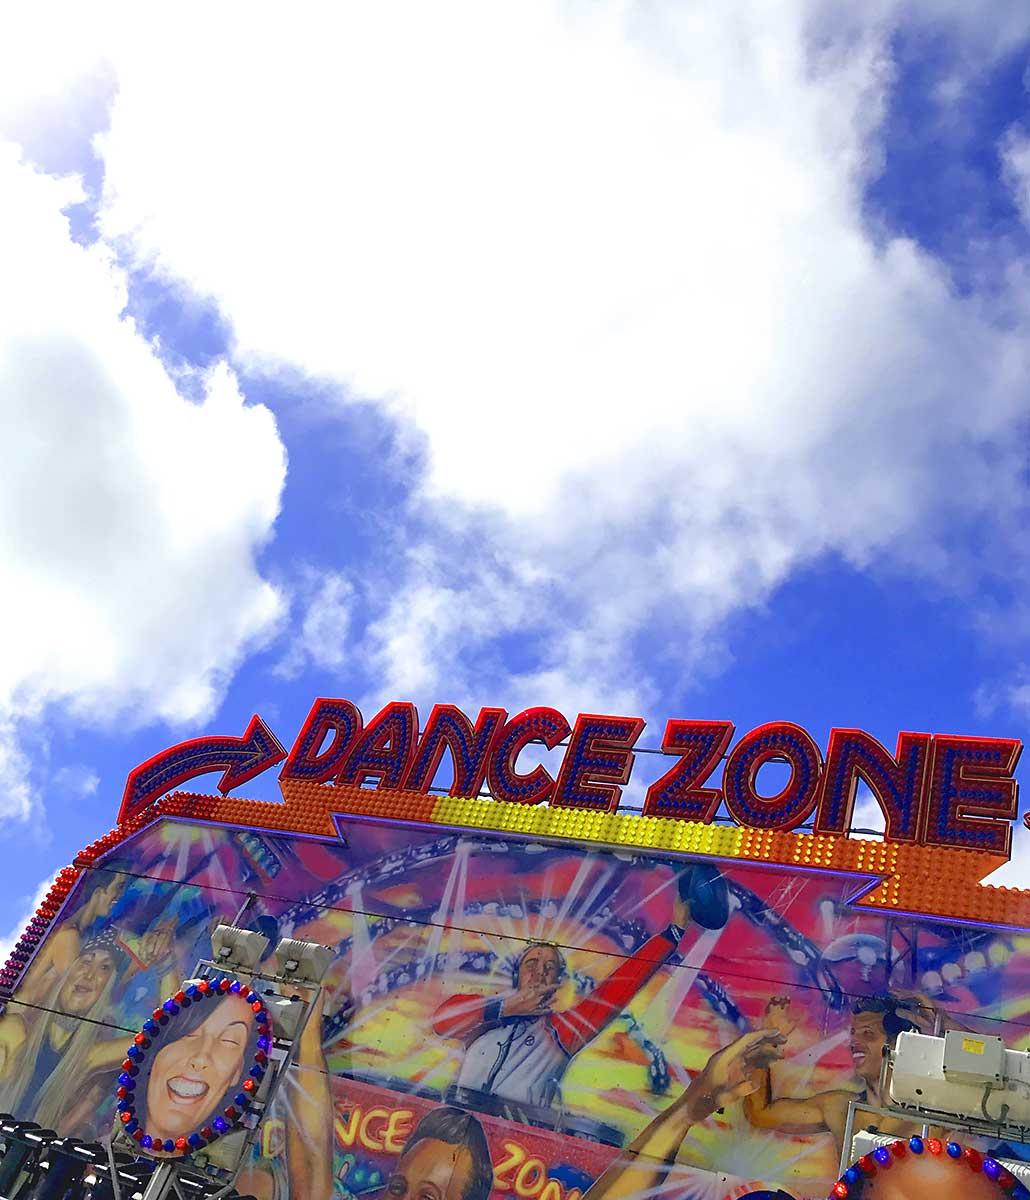 Dance Zone - Llantwit Major Fair